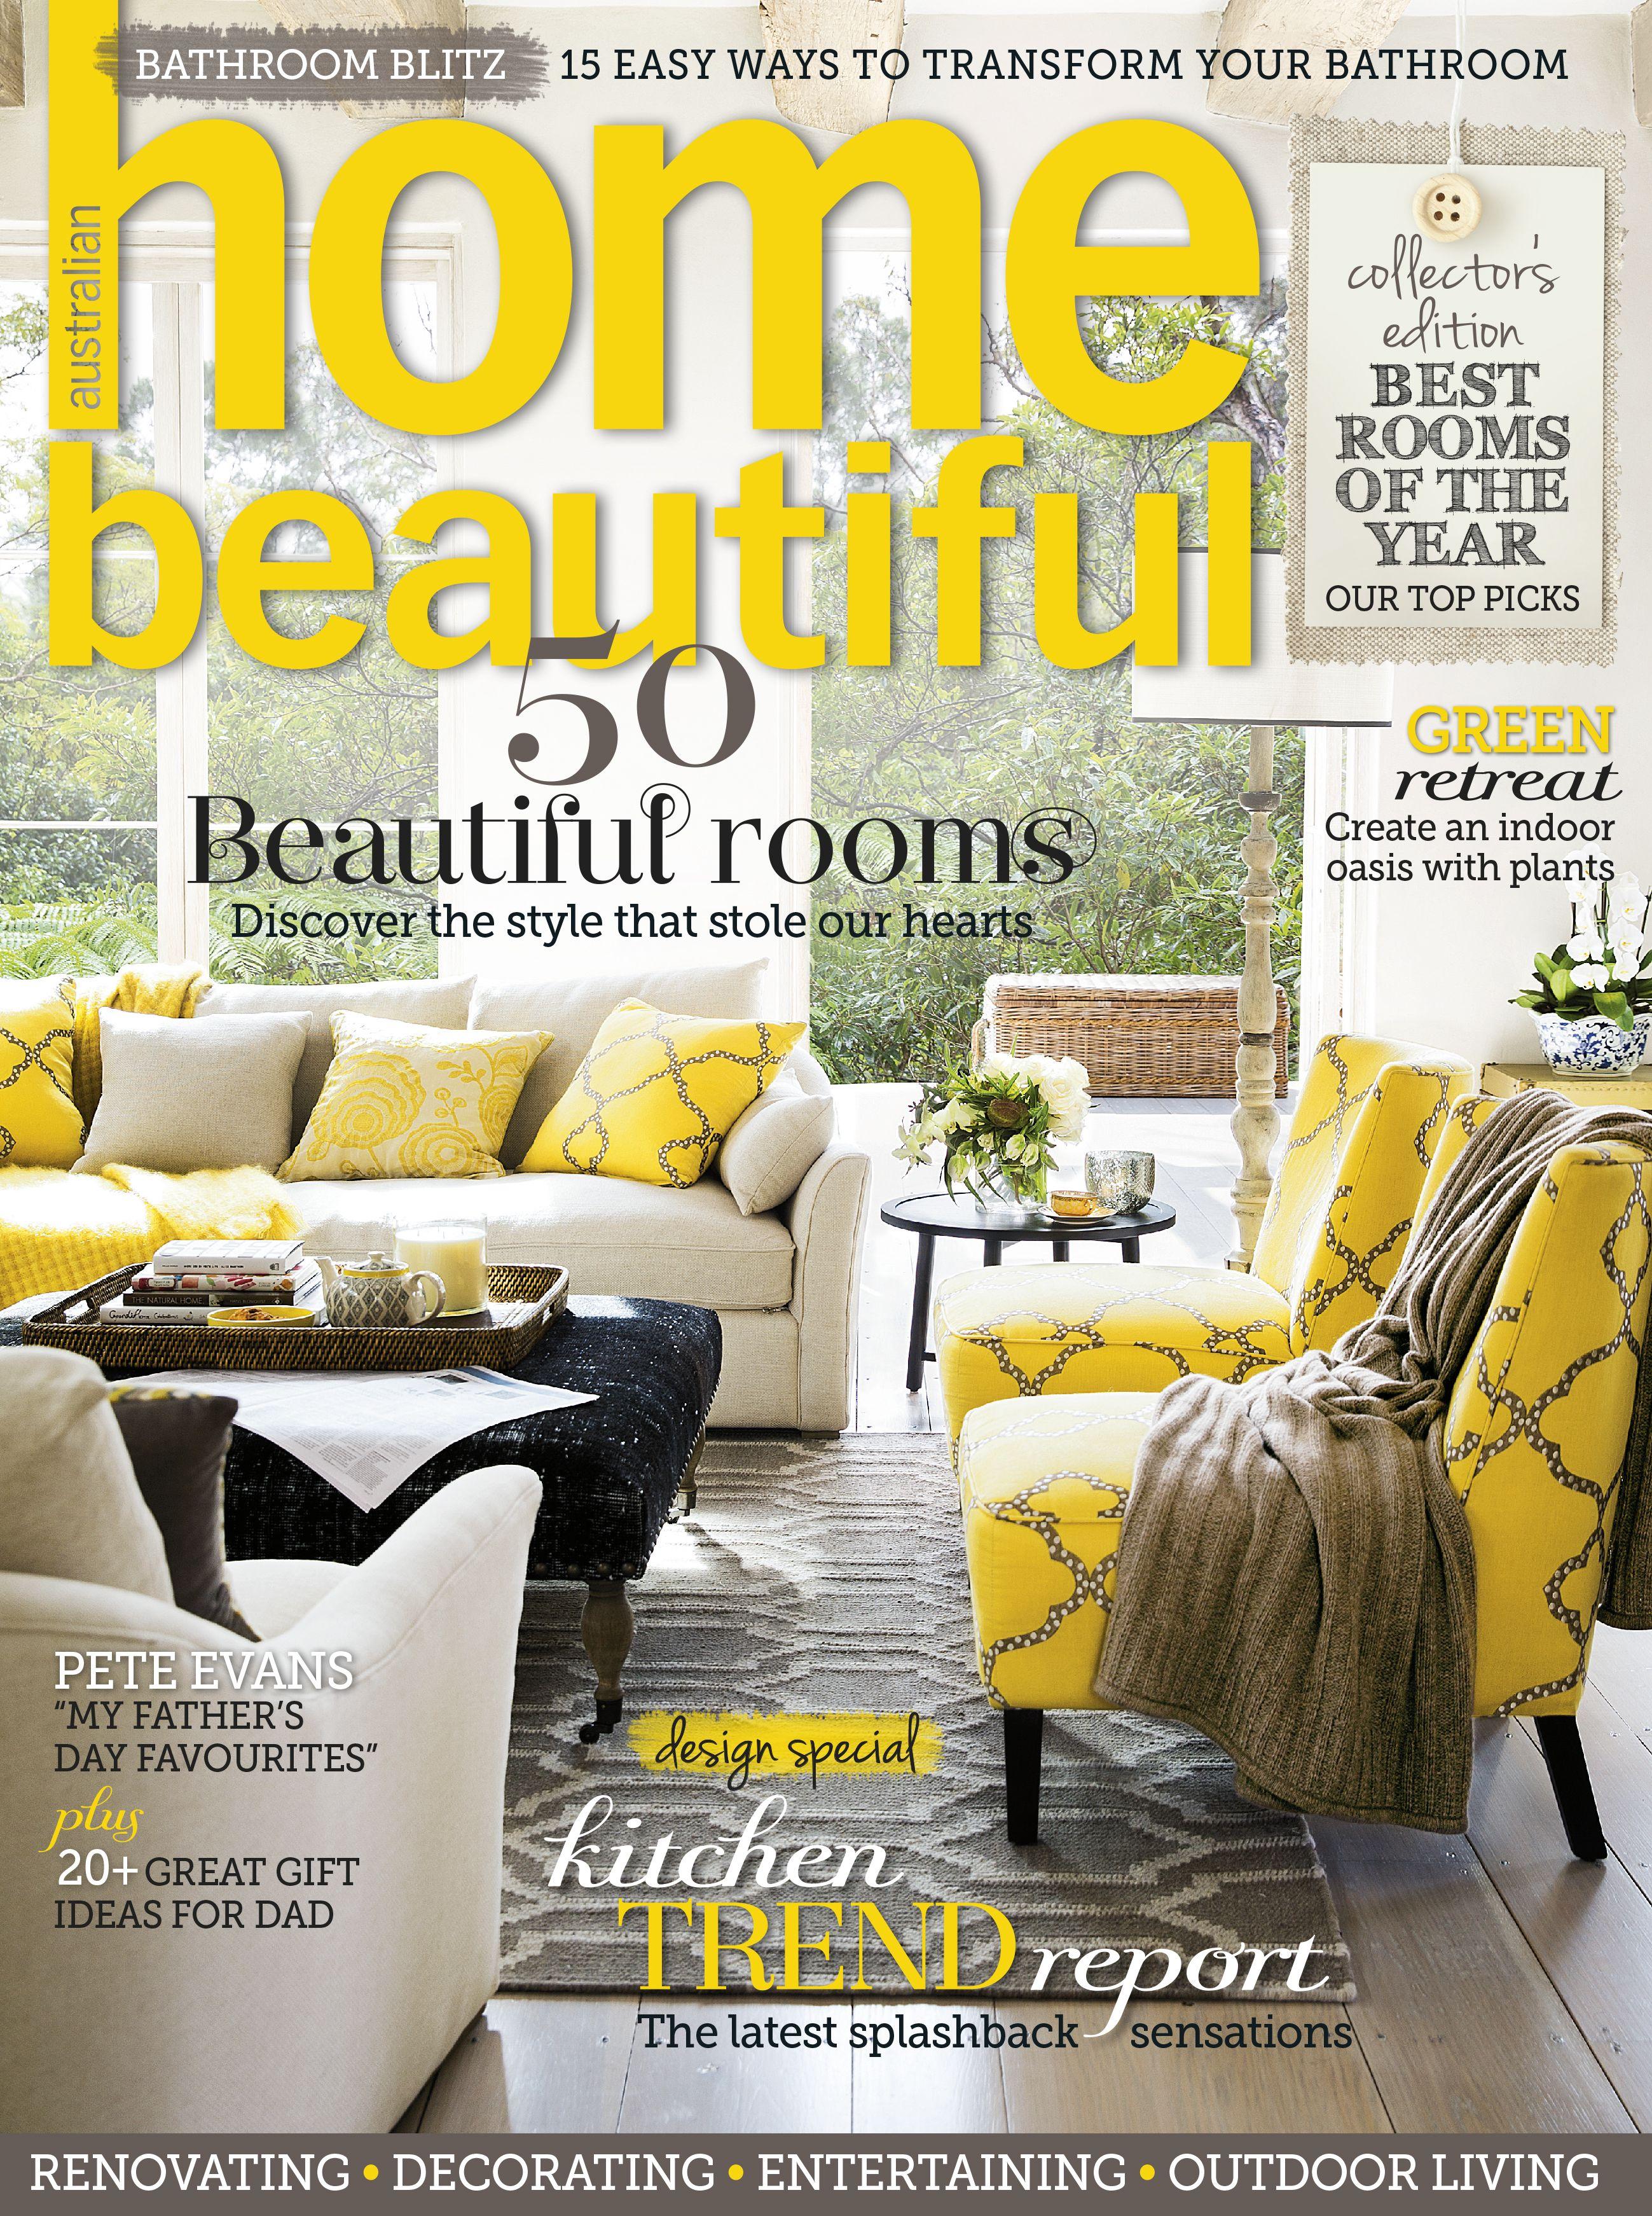 Home Beautiful September 2013 House, home magazine, Home